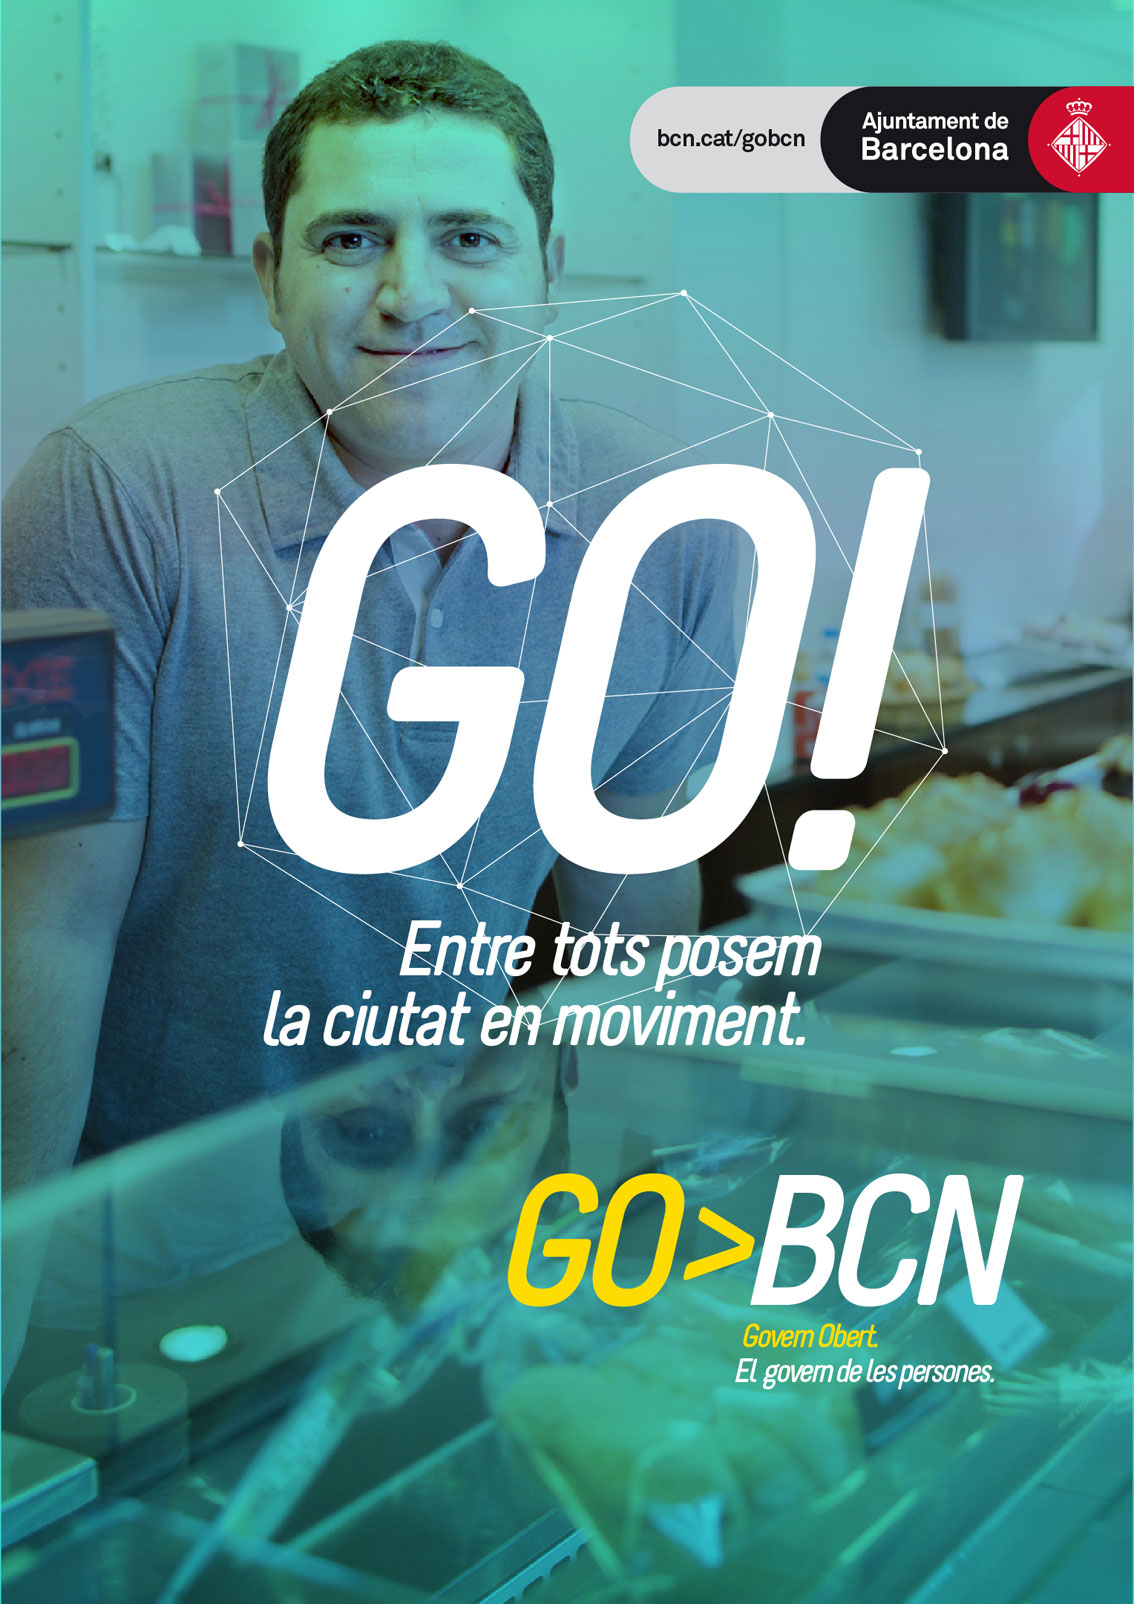 gobcn-03.jpg